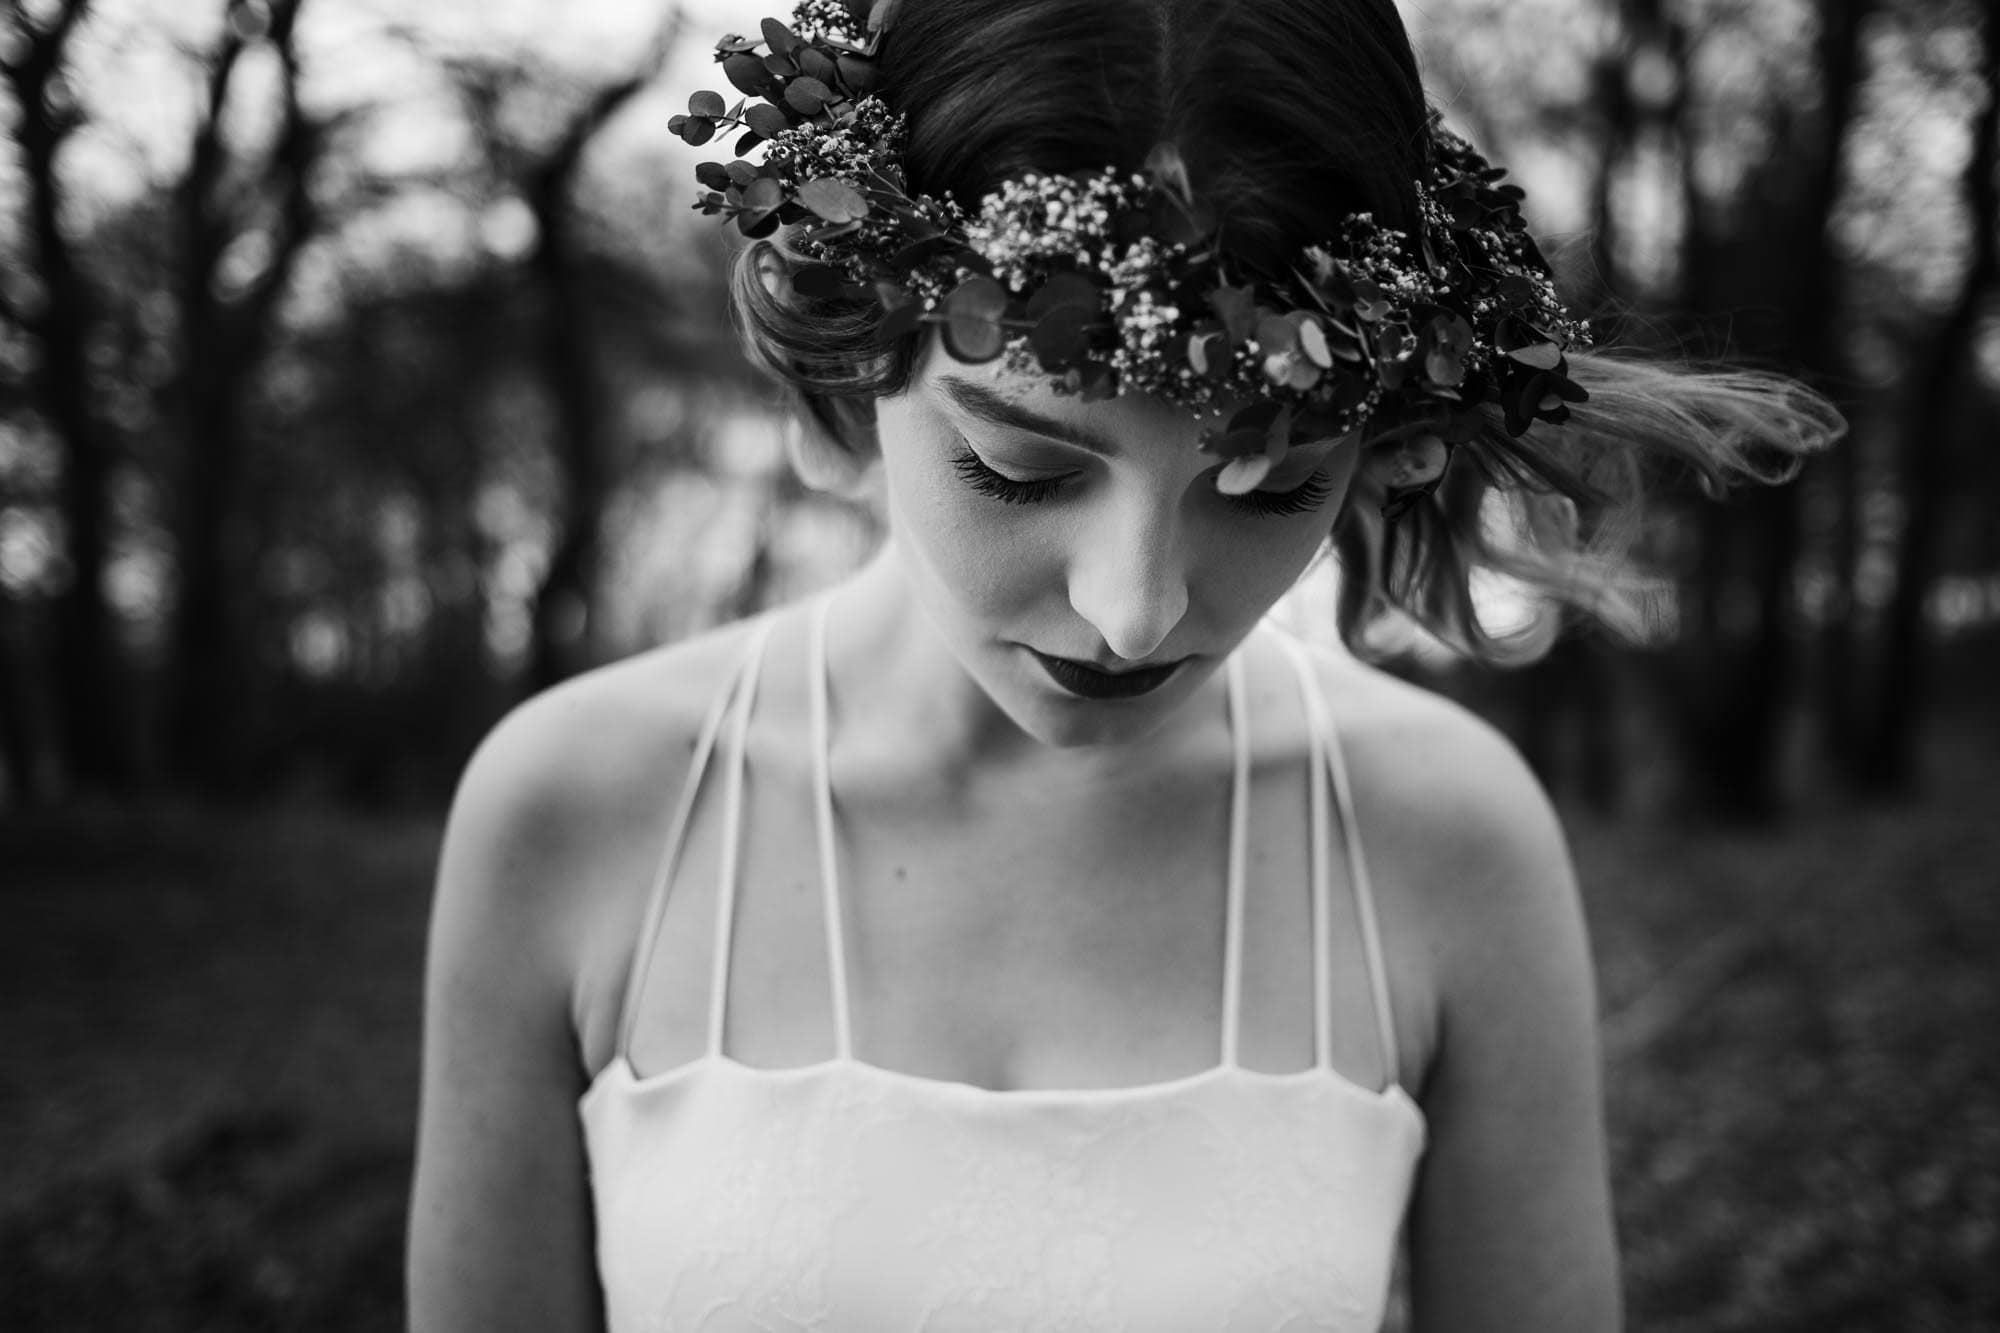 Brautmode Hamburg- Kollektion Spring- Hochzeitskleid im Bohr-Stil mit Spaghettiträgern